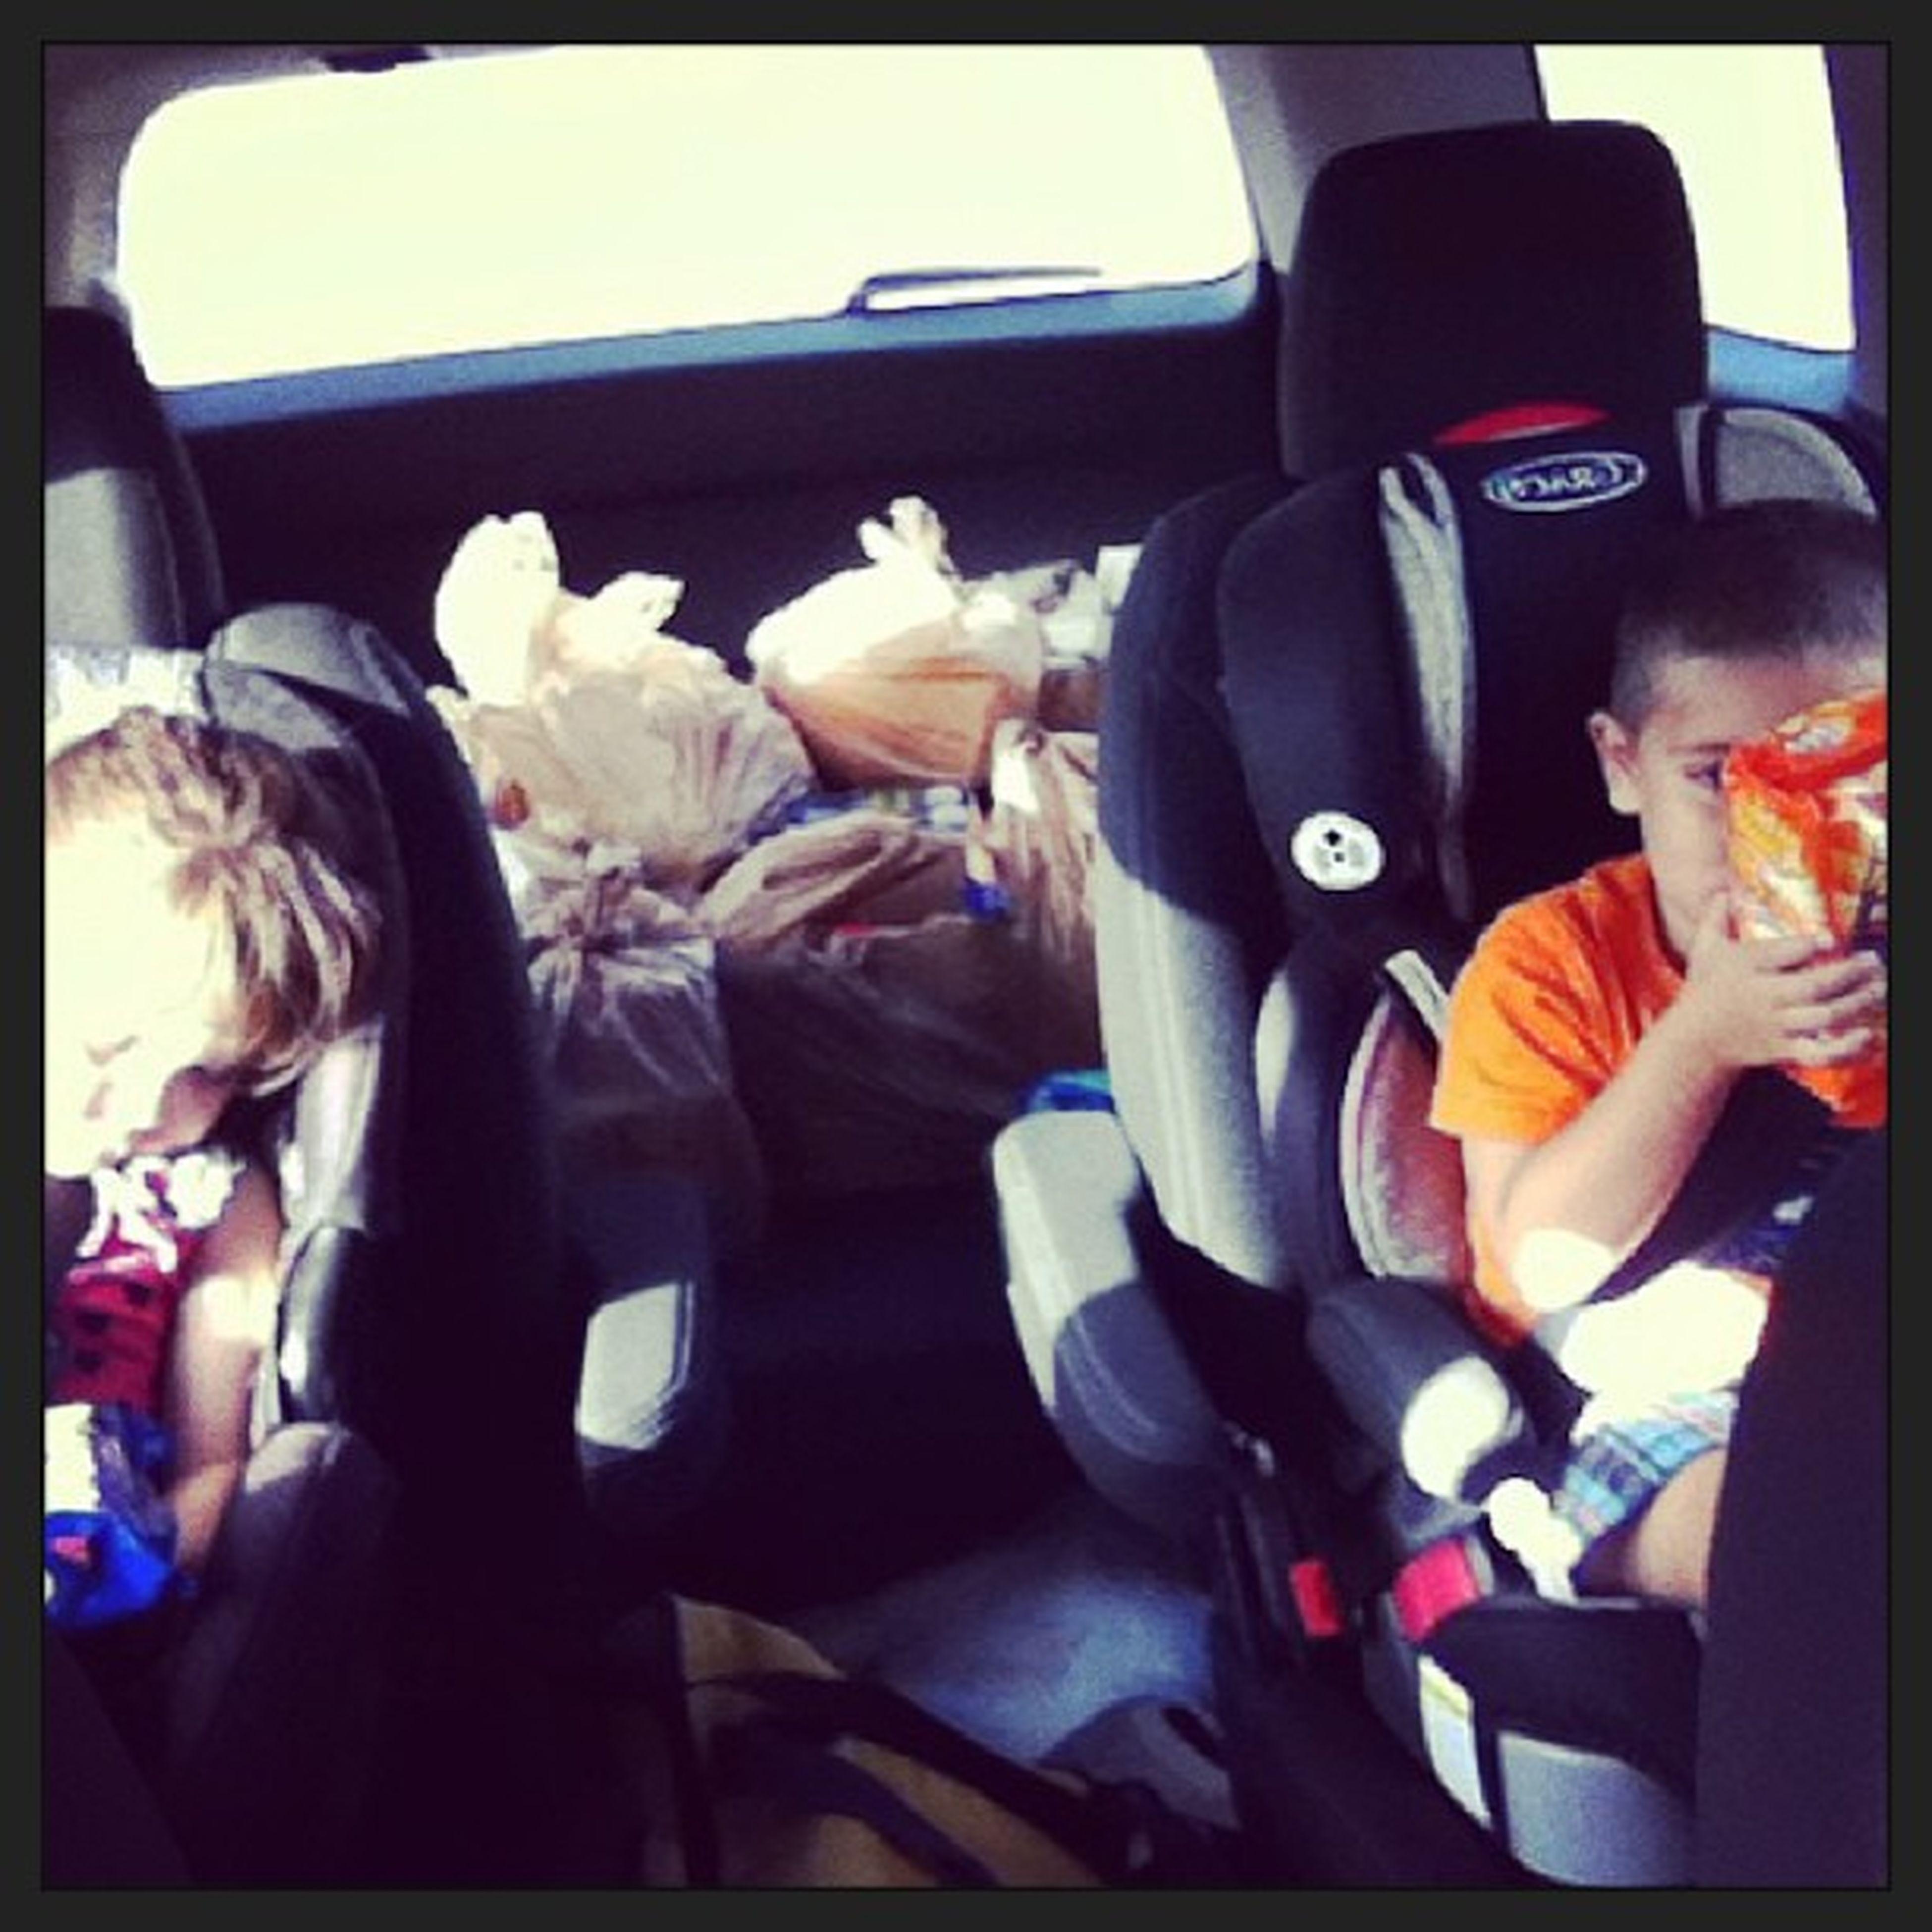 Dad, lee and Dennis are working on the car while me kids and Harmie get groceries. Poor Ellie threw up:/ Commissary Harmie Me Kinds jazzyfreshsoraelliekeenersinstagramgroceryshoppingsaturdaysickbabygoldfish